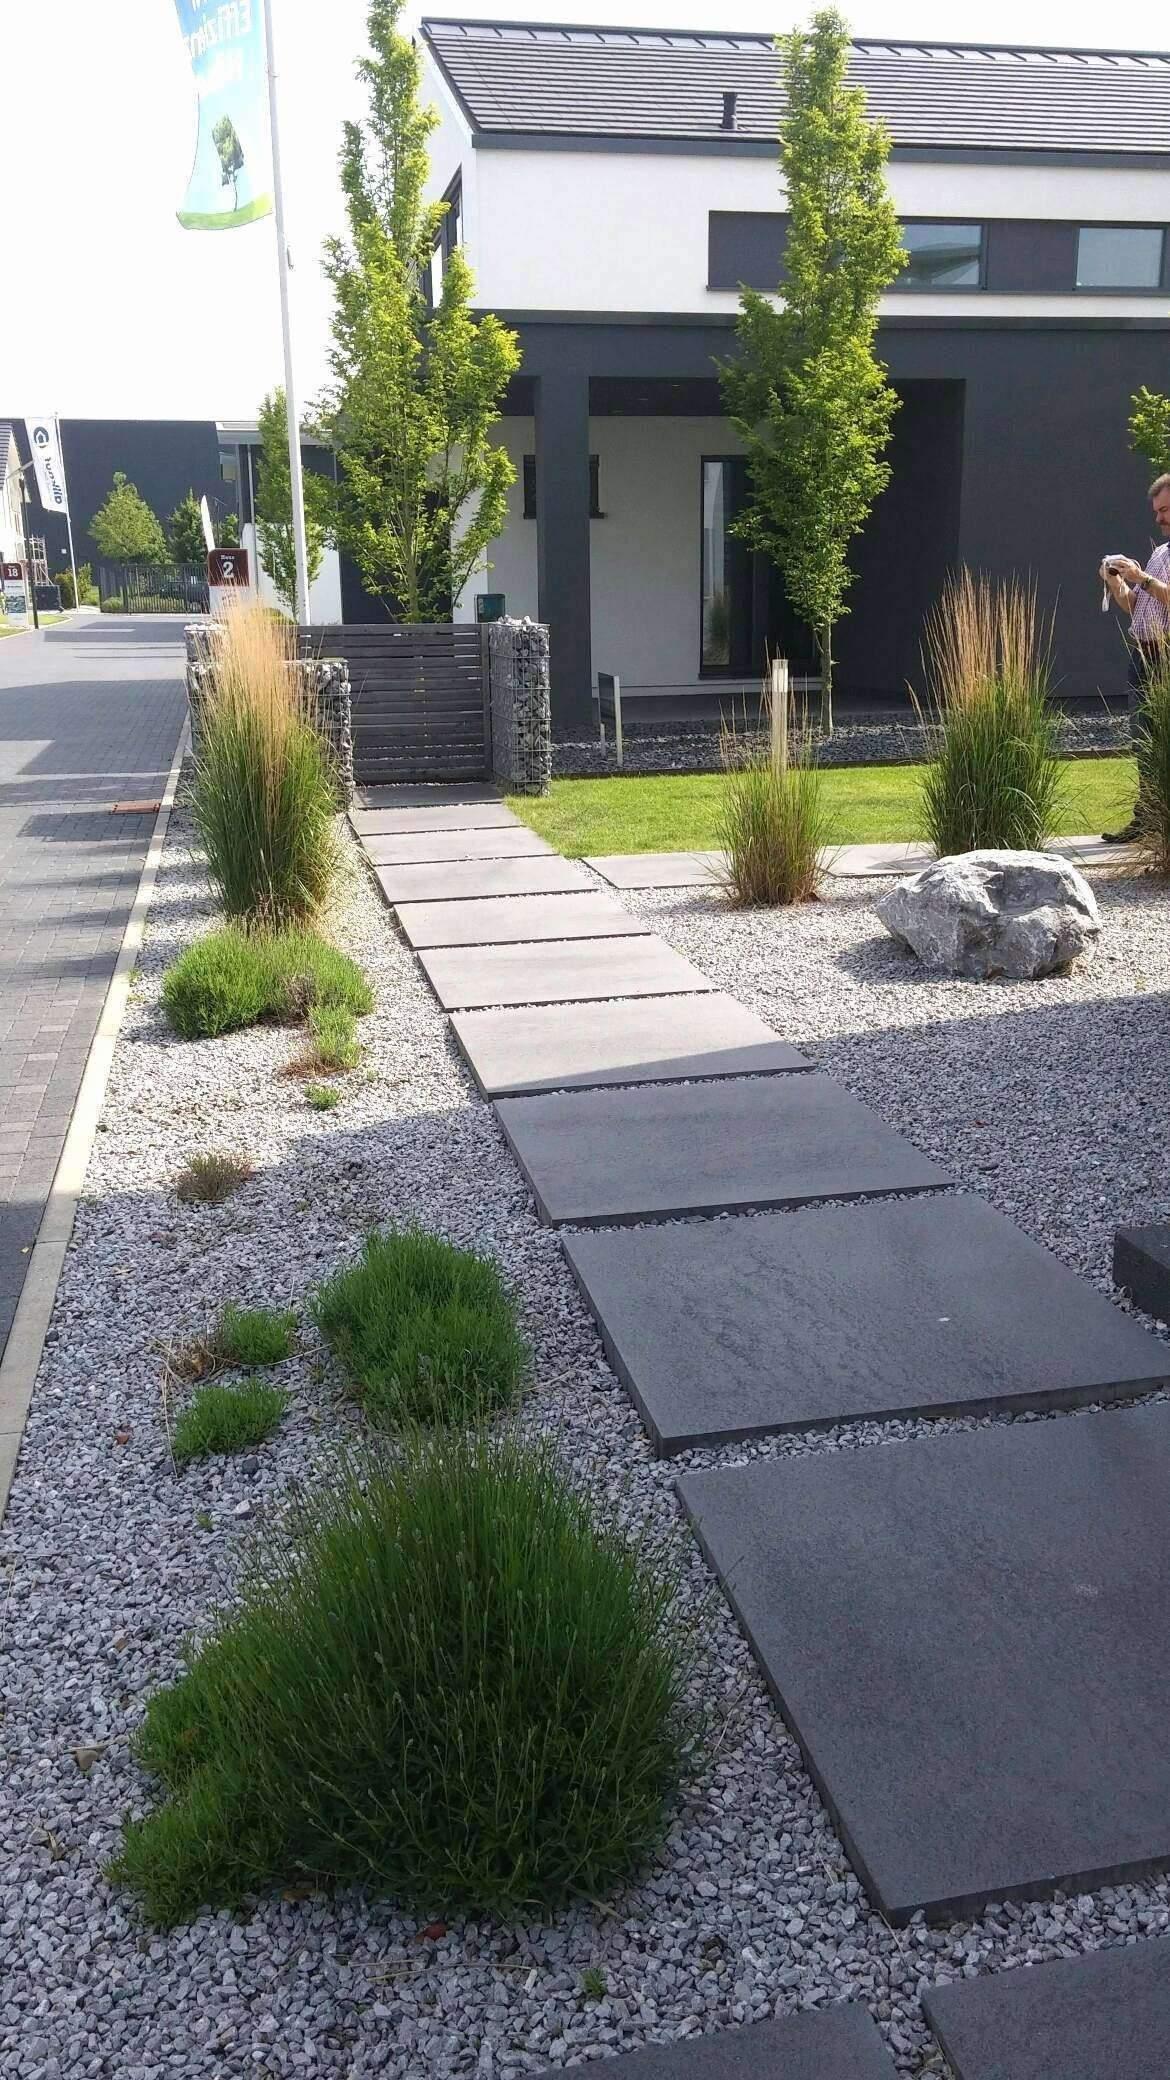 Aussenleuchten Garten Schön Garten Ideas Garten Anlegen Lovely Aussenleuchten Garten 0d